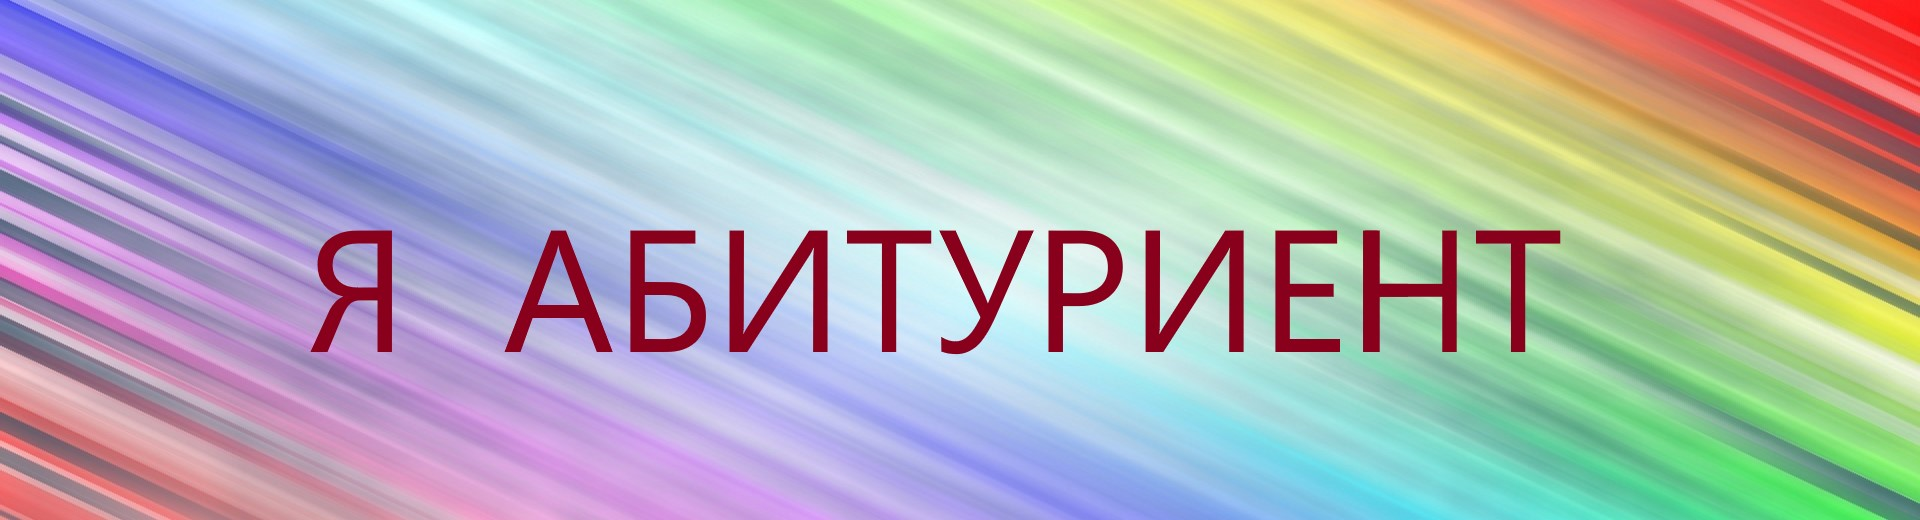 ПОРТАЛ КФУ \ Образование \ Институт физики \ Абитуриенту